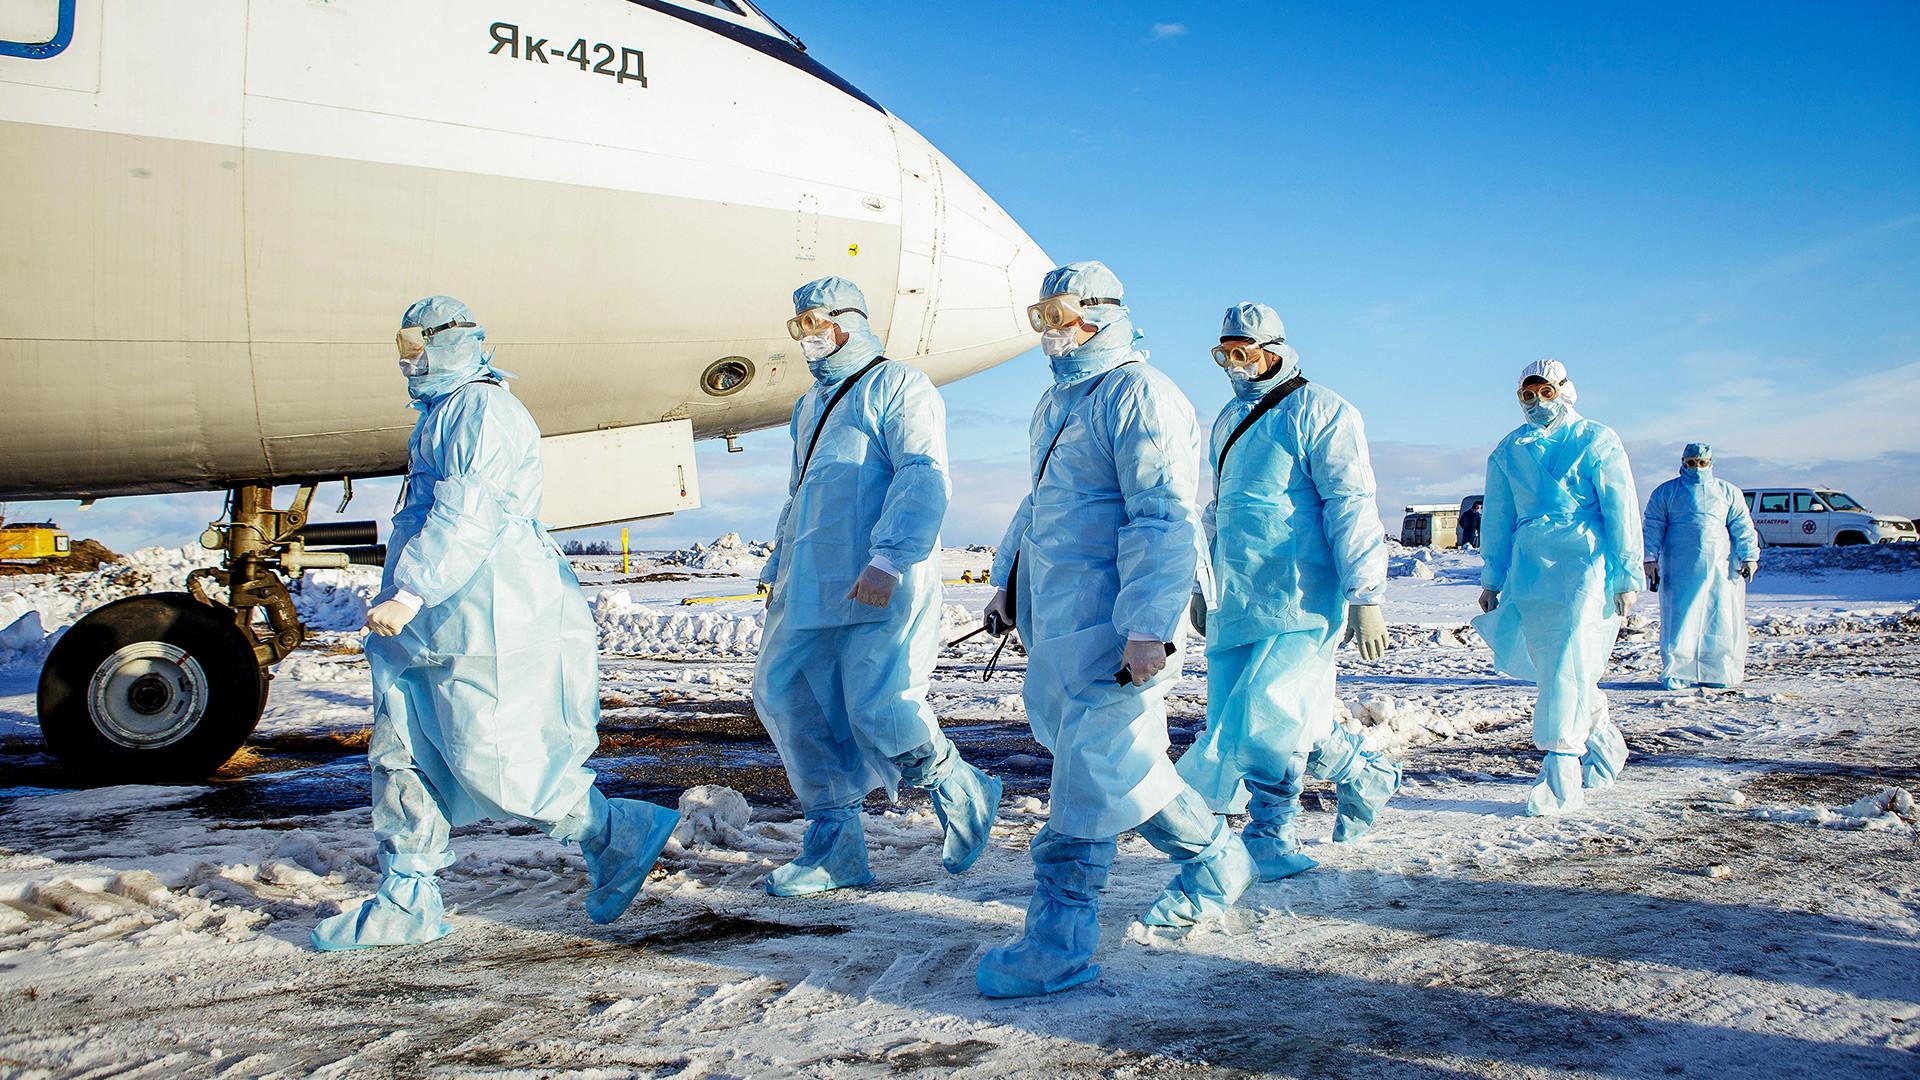 Pelatihan evakuasi penumpang yang diduga terinfeksi COVID-19 di Bandara Chelyabinsk, 5 Februari 2020.